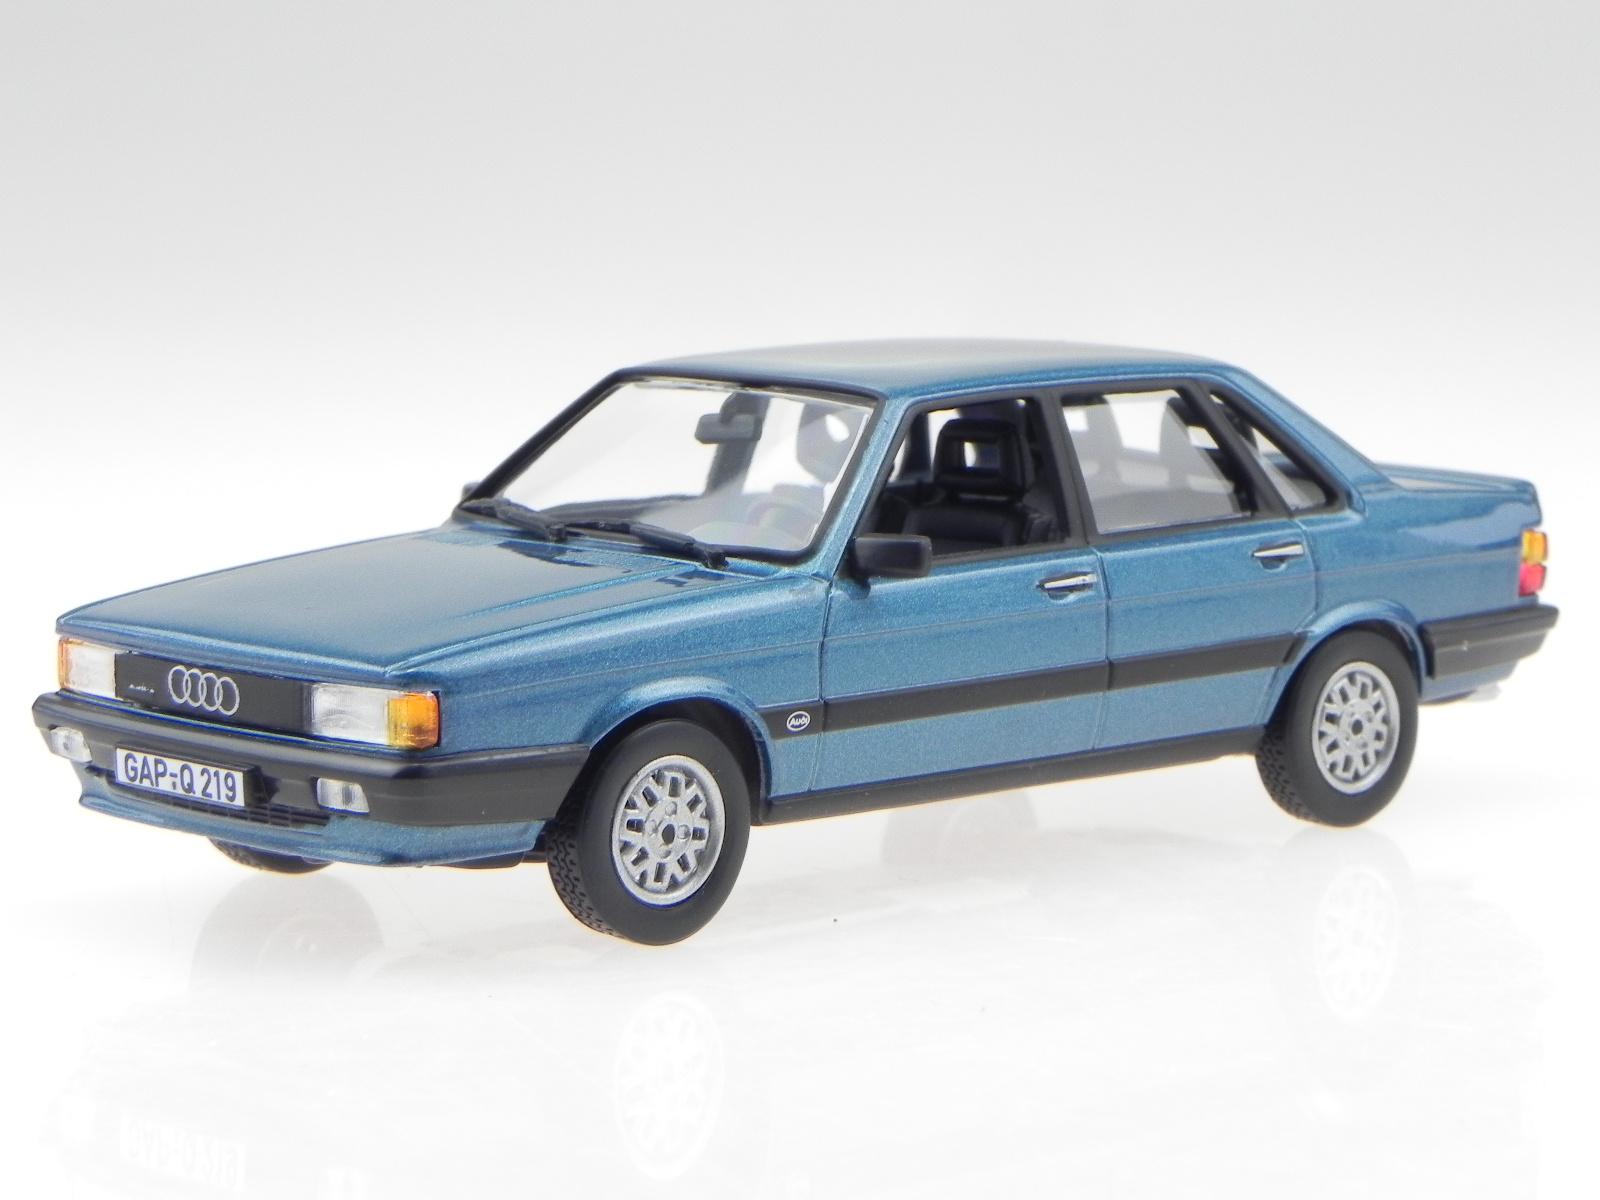 audi 80 b2 quattro 1985 blau modellauto 830027 norev 1 43. Black Bedroom Furniture Sets. Home Design Ideas